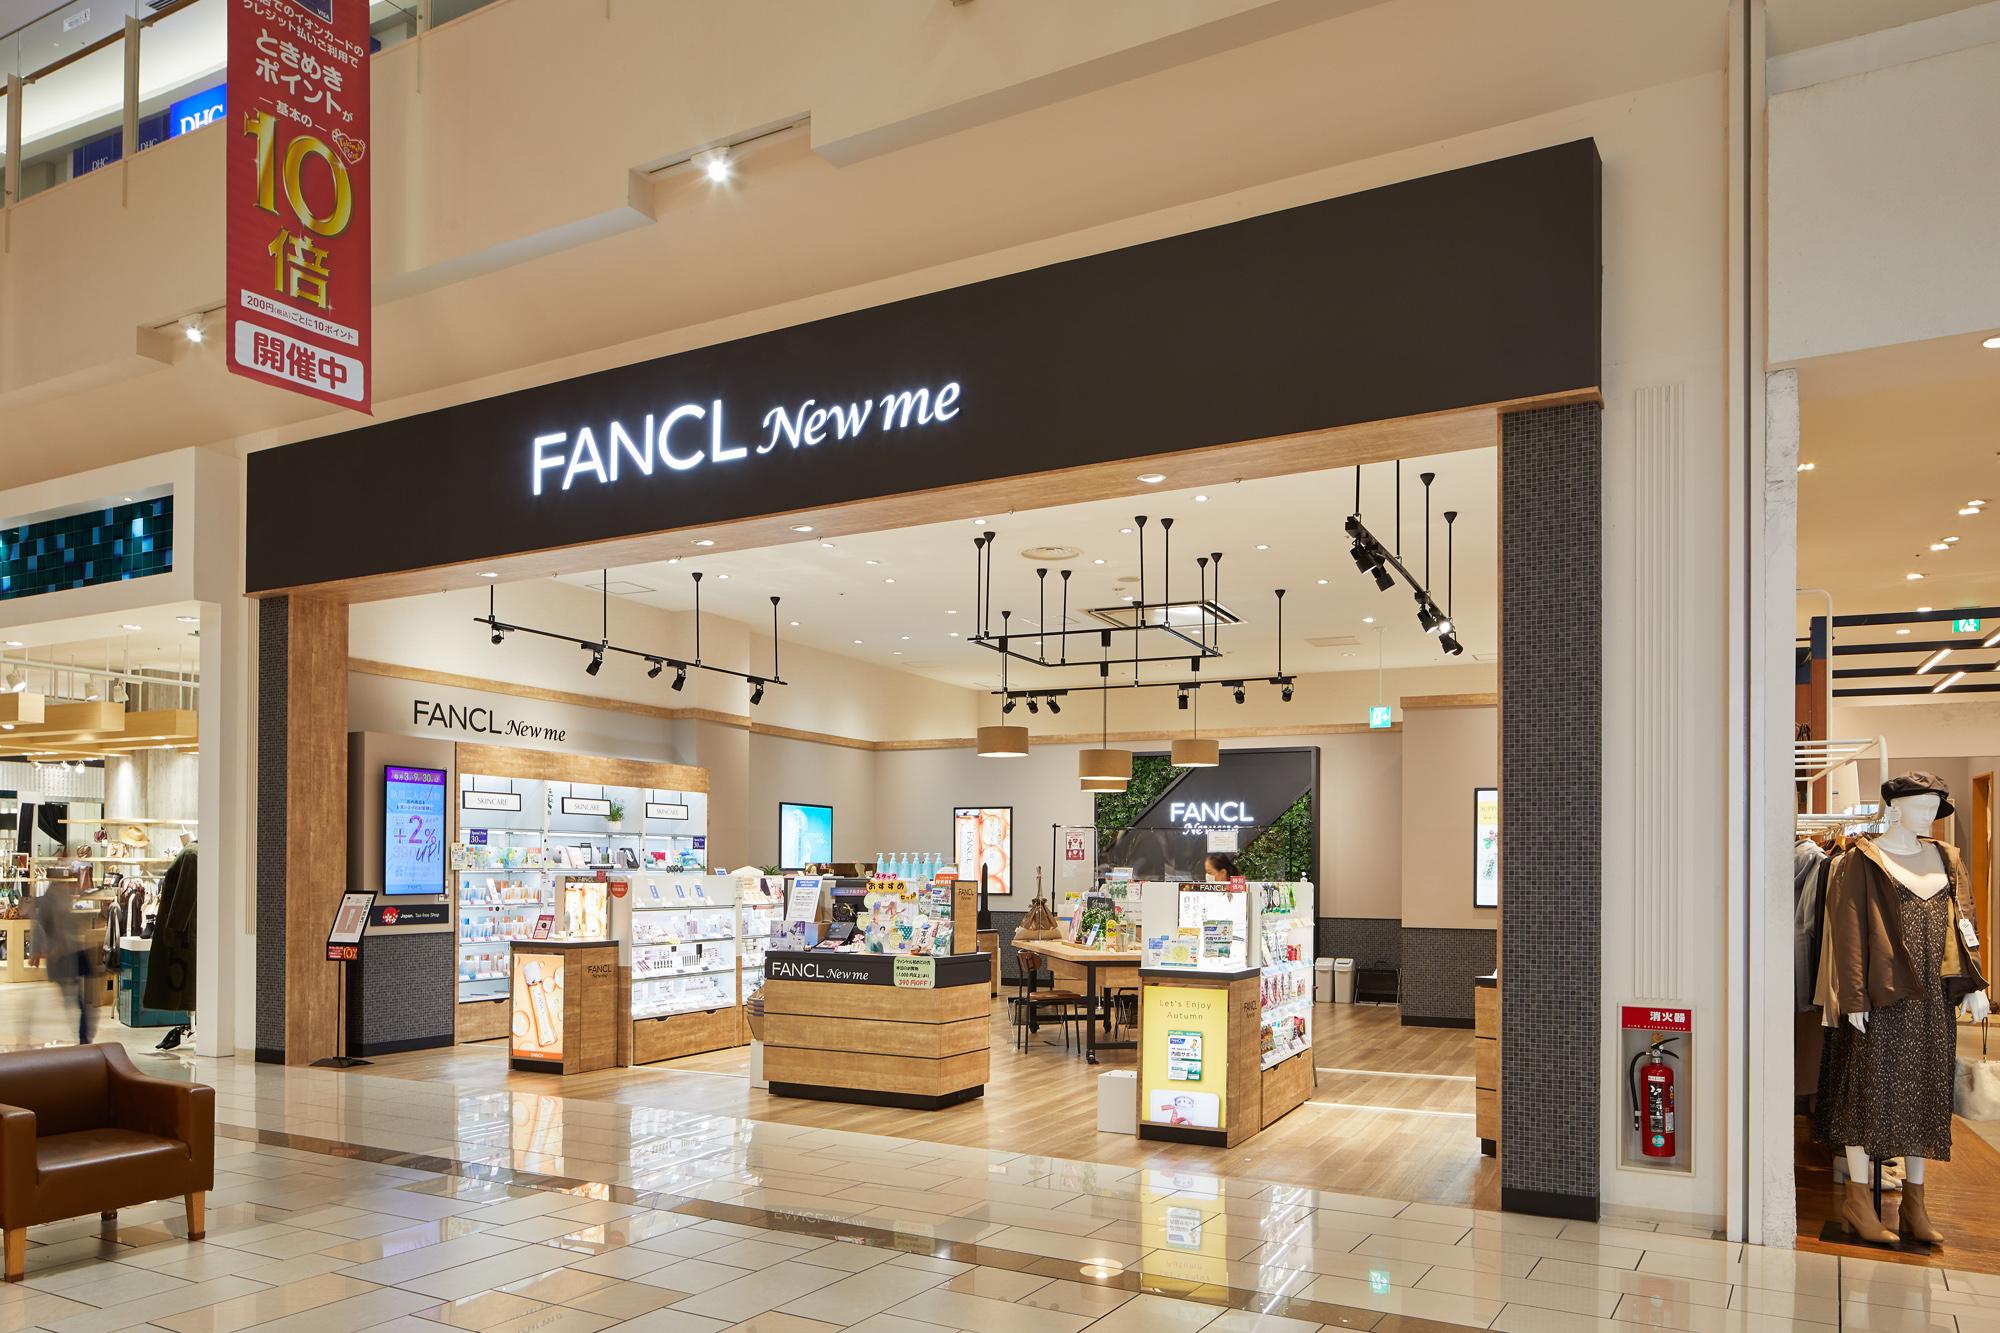 FANCL New me イオンモール草津店